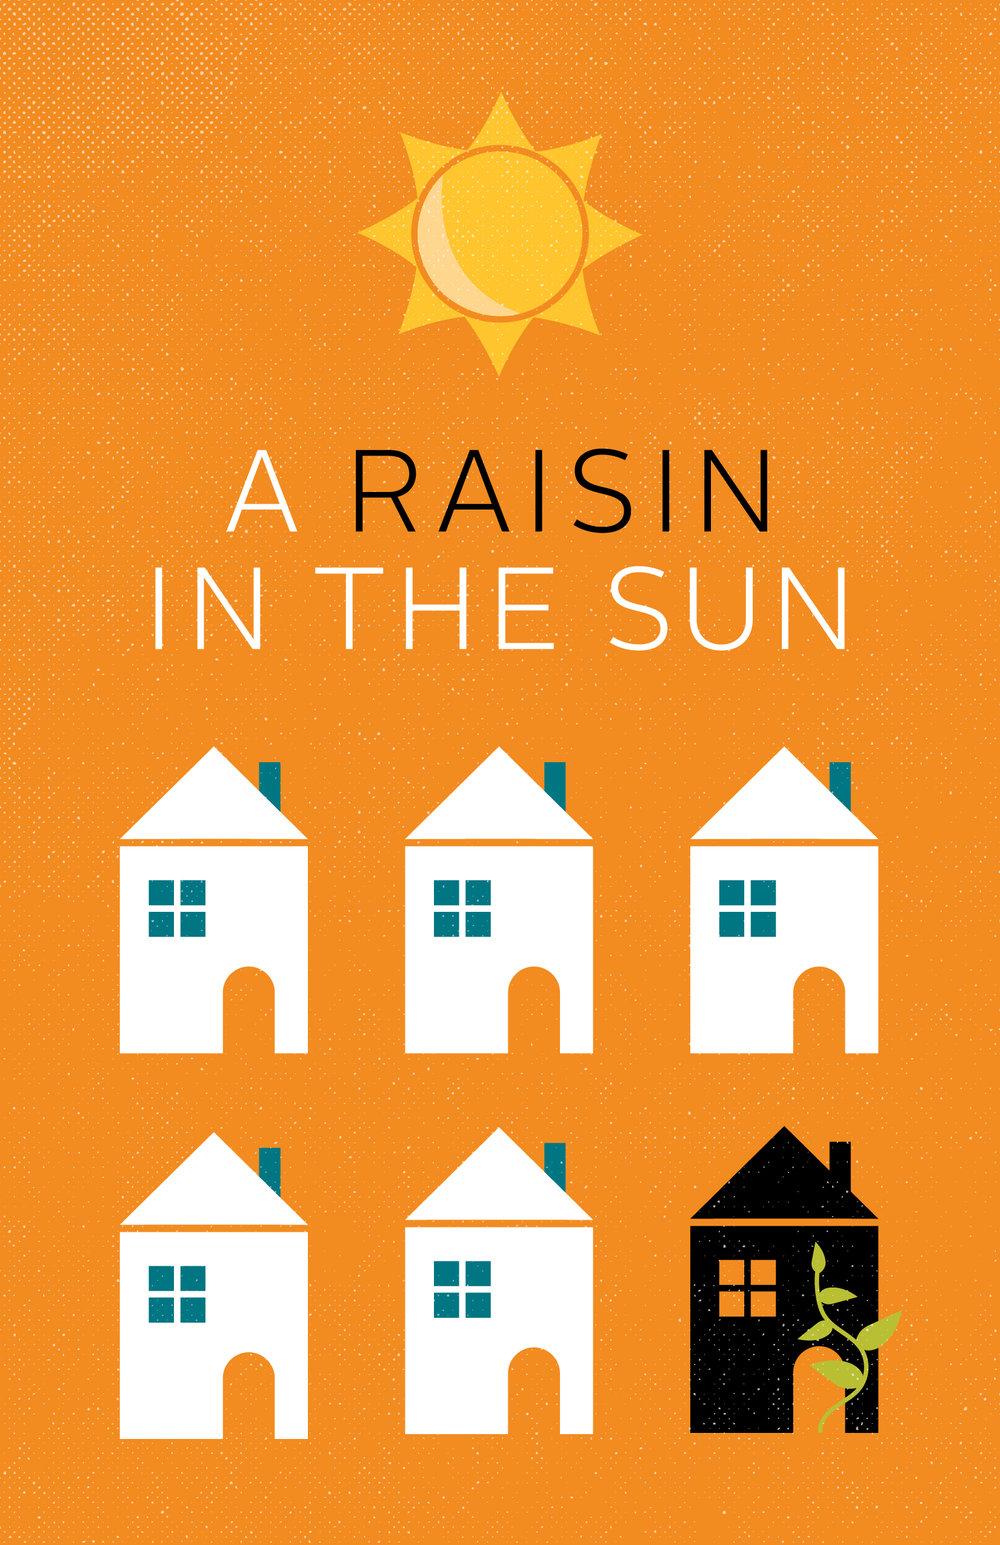 1819-09-Raisin-in-the-Sun-Show-Image-Vertical.jpg